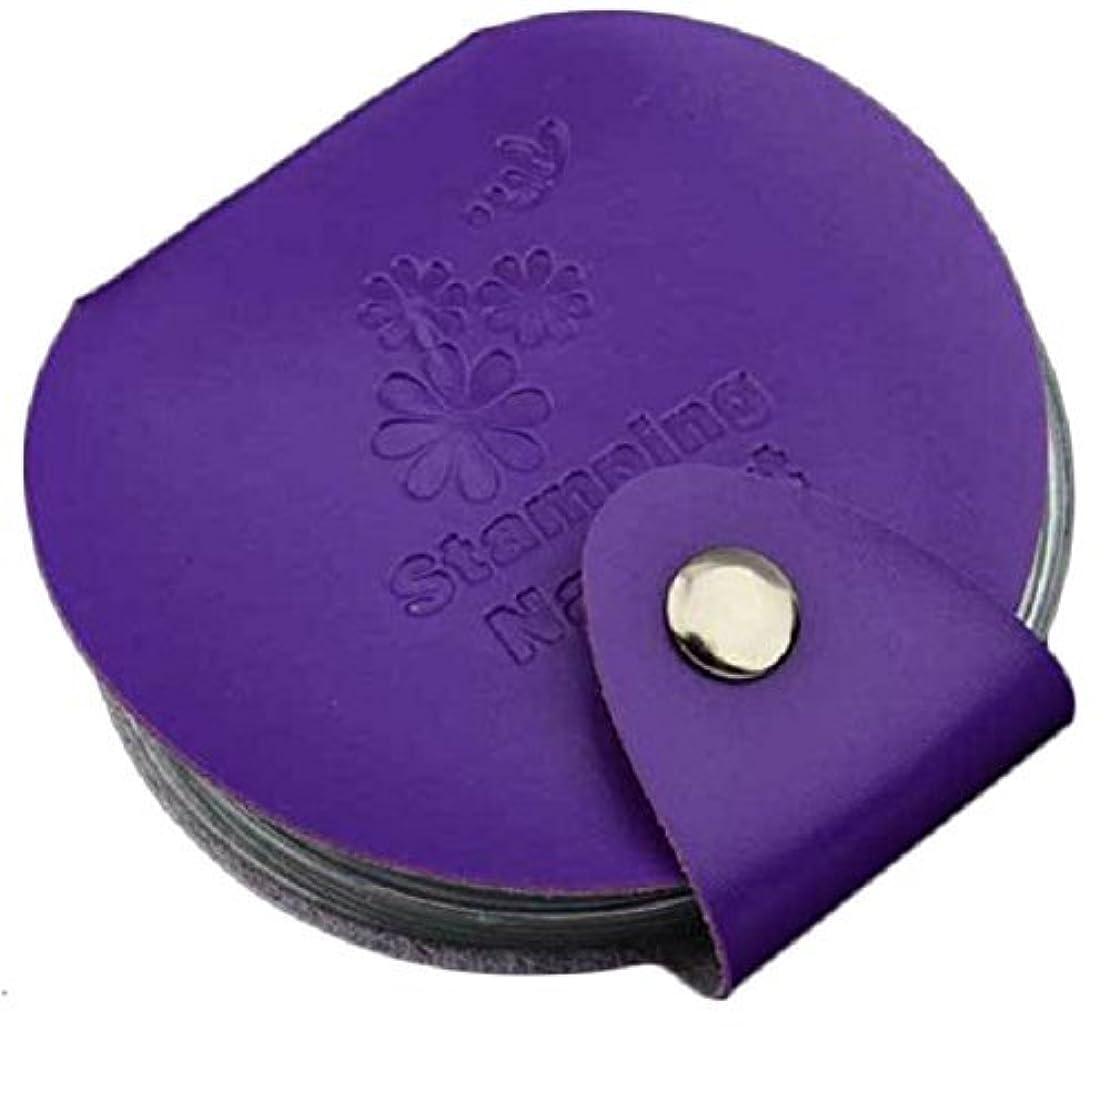 SODIAL ネイルプリントテンプレートカードパック ラウンドカードスリーブ(パープルカラー)